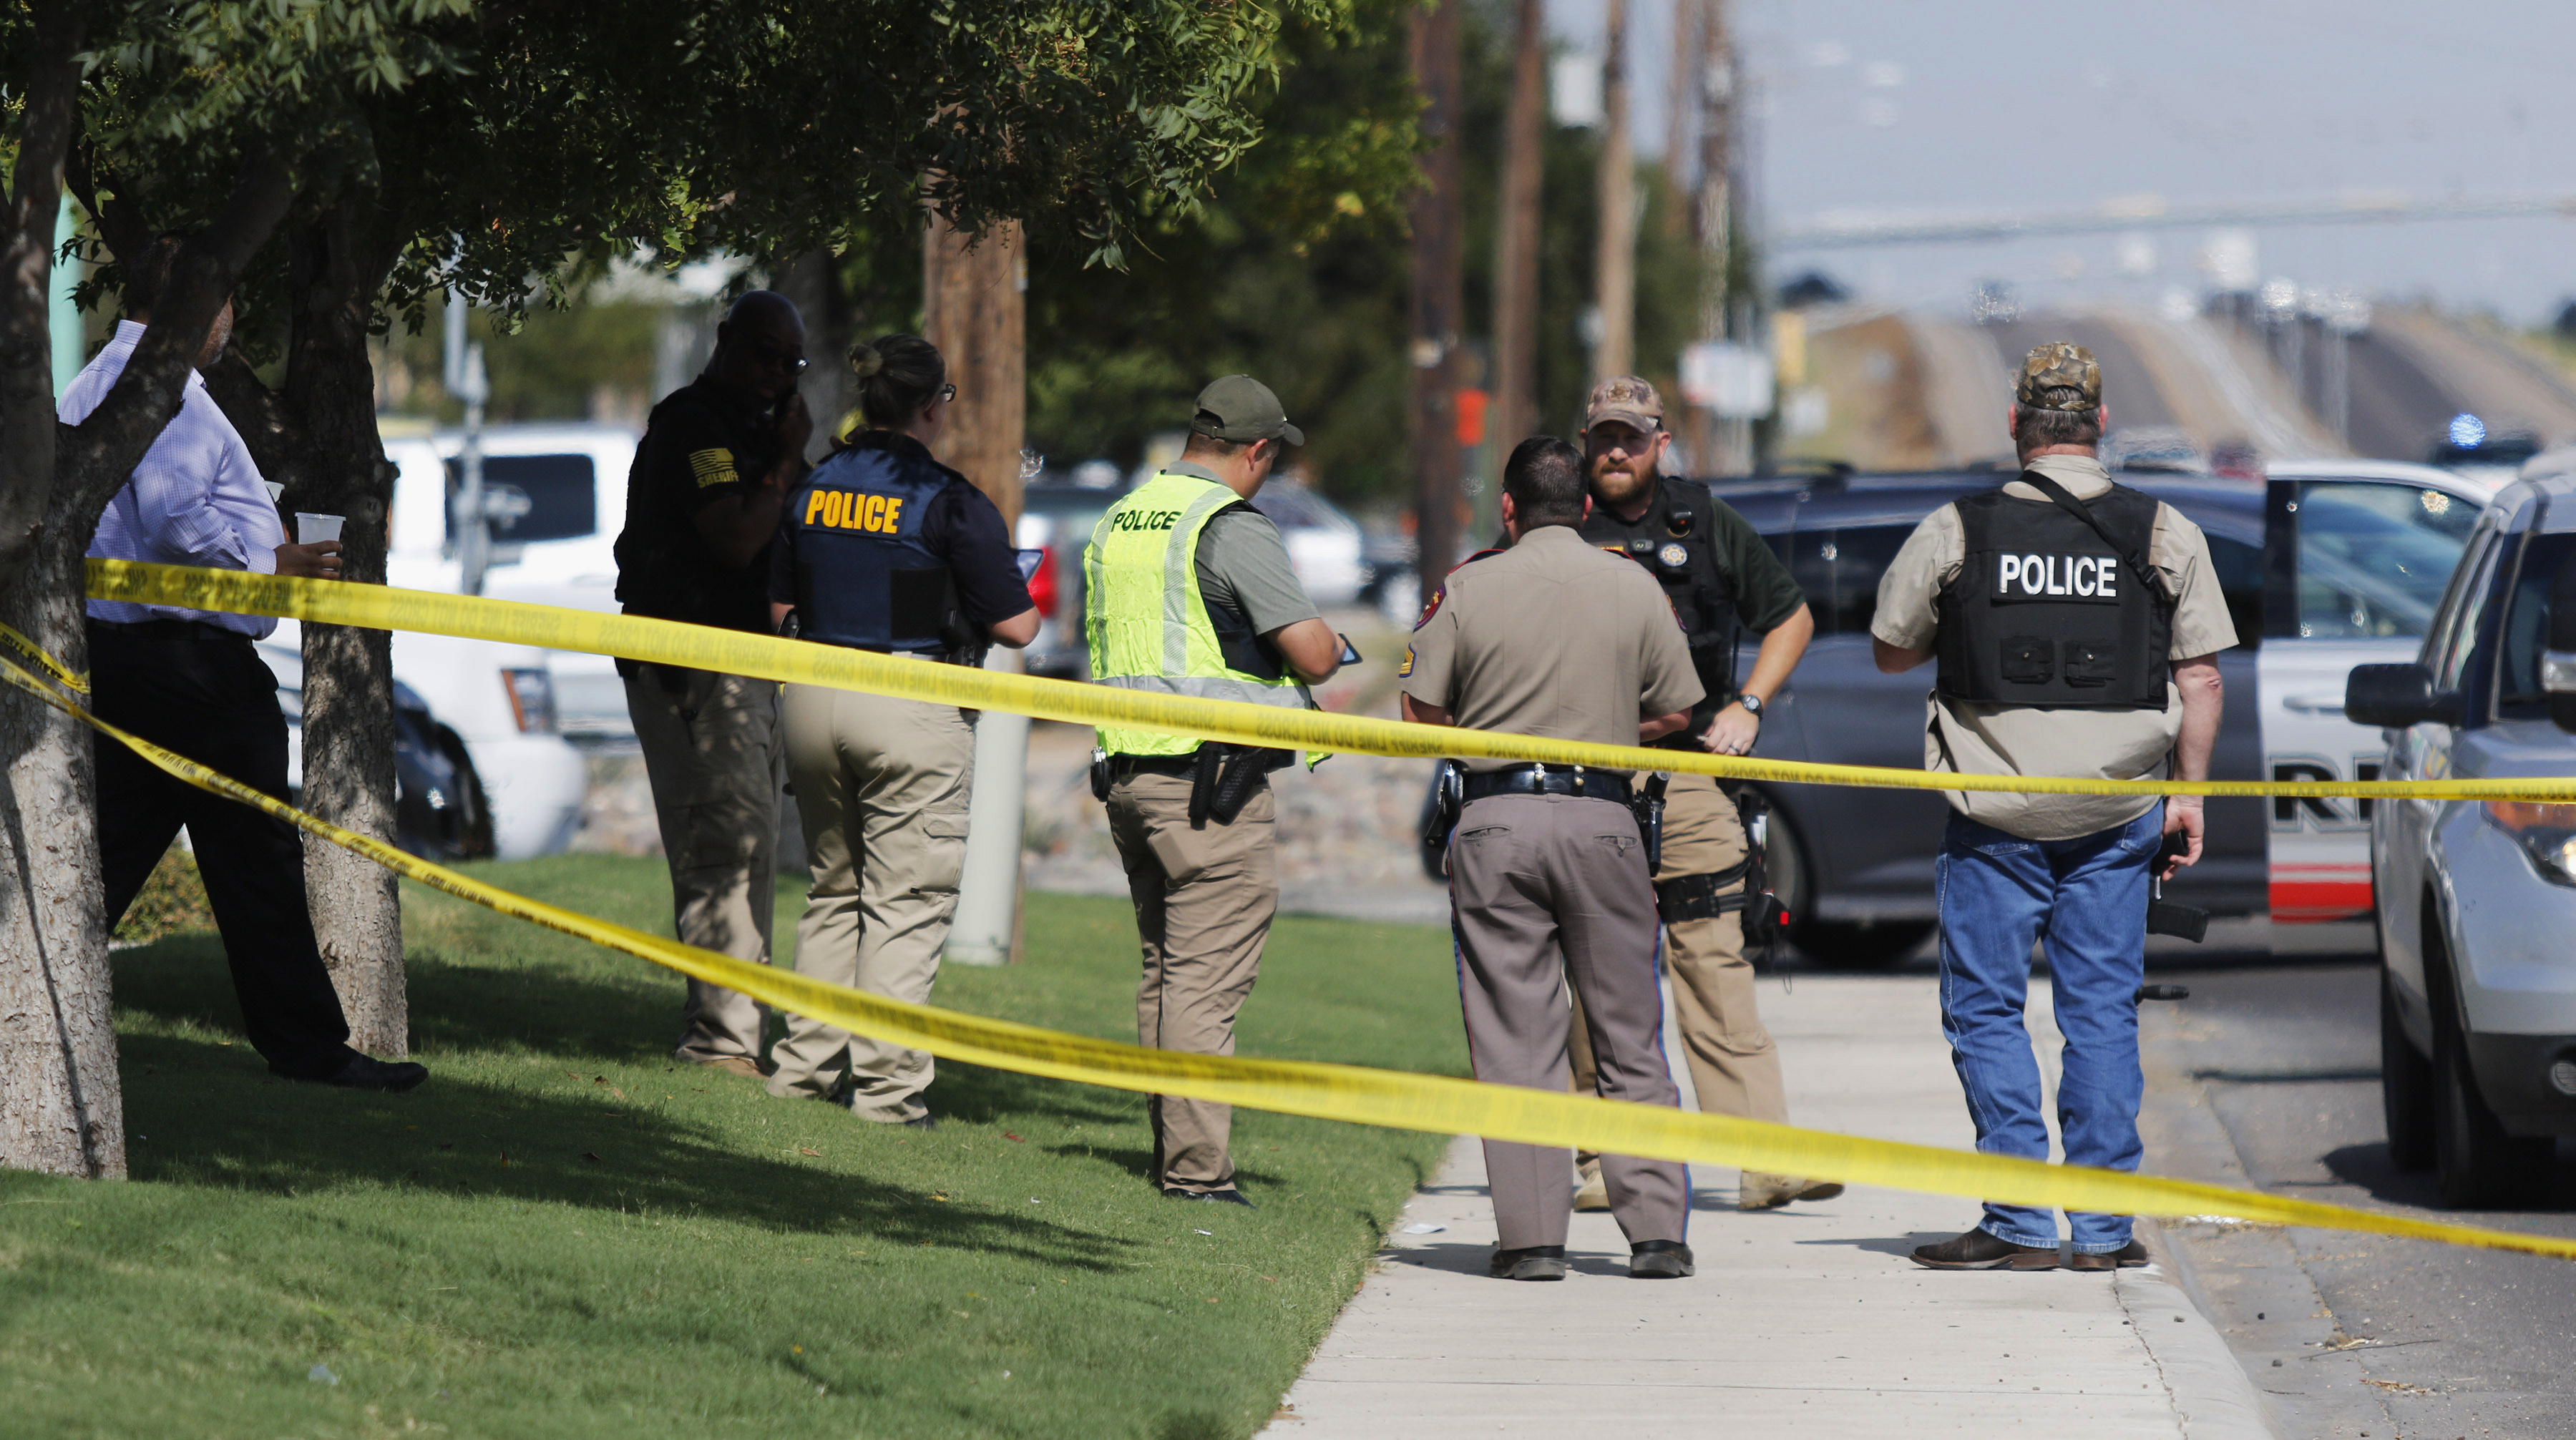 The Latest: West Texas residents grieve at prayer vigil